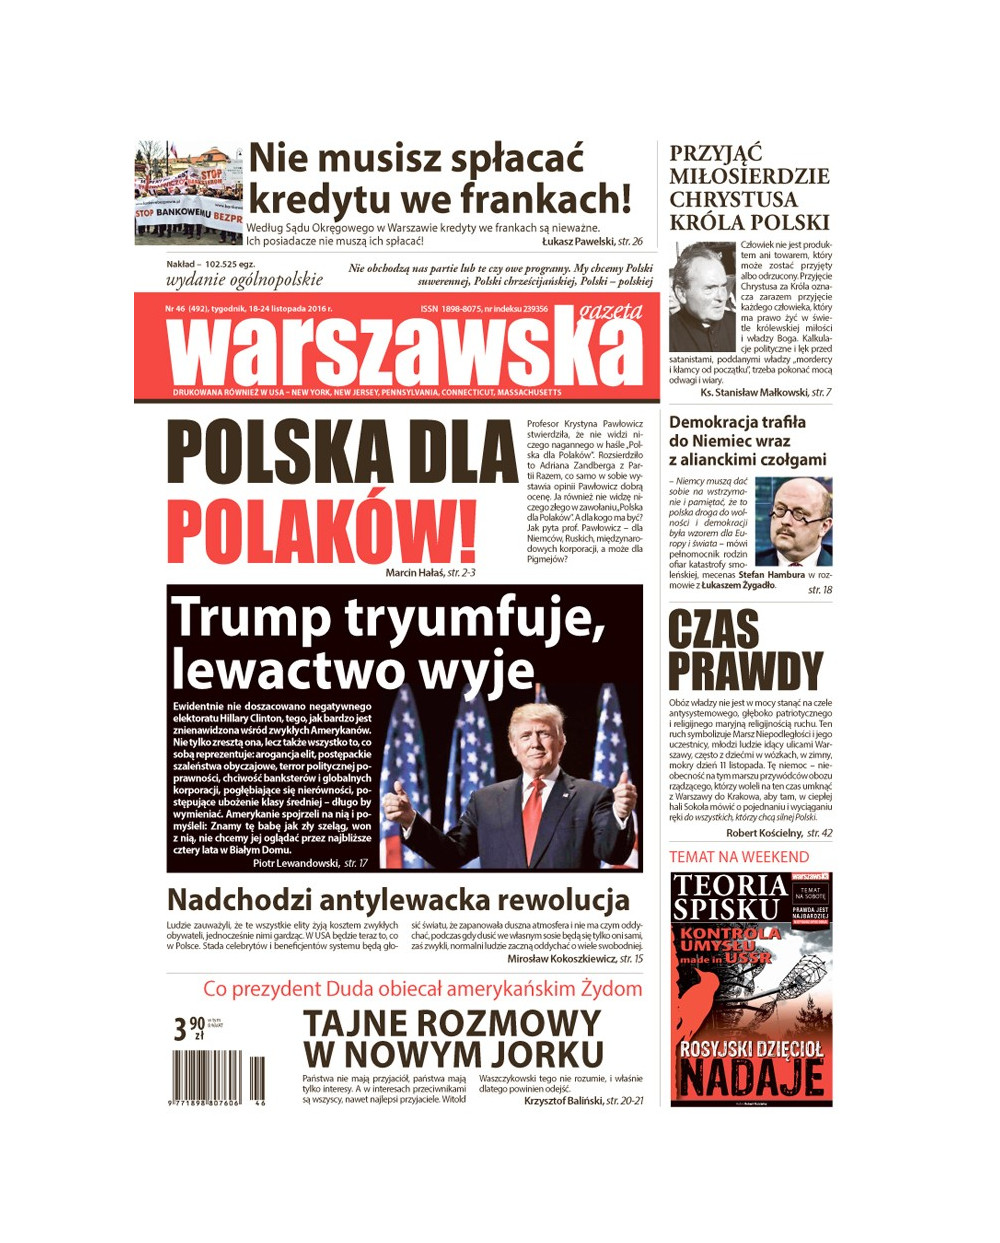 Warszawska Gazeta 46/2016